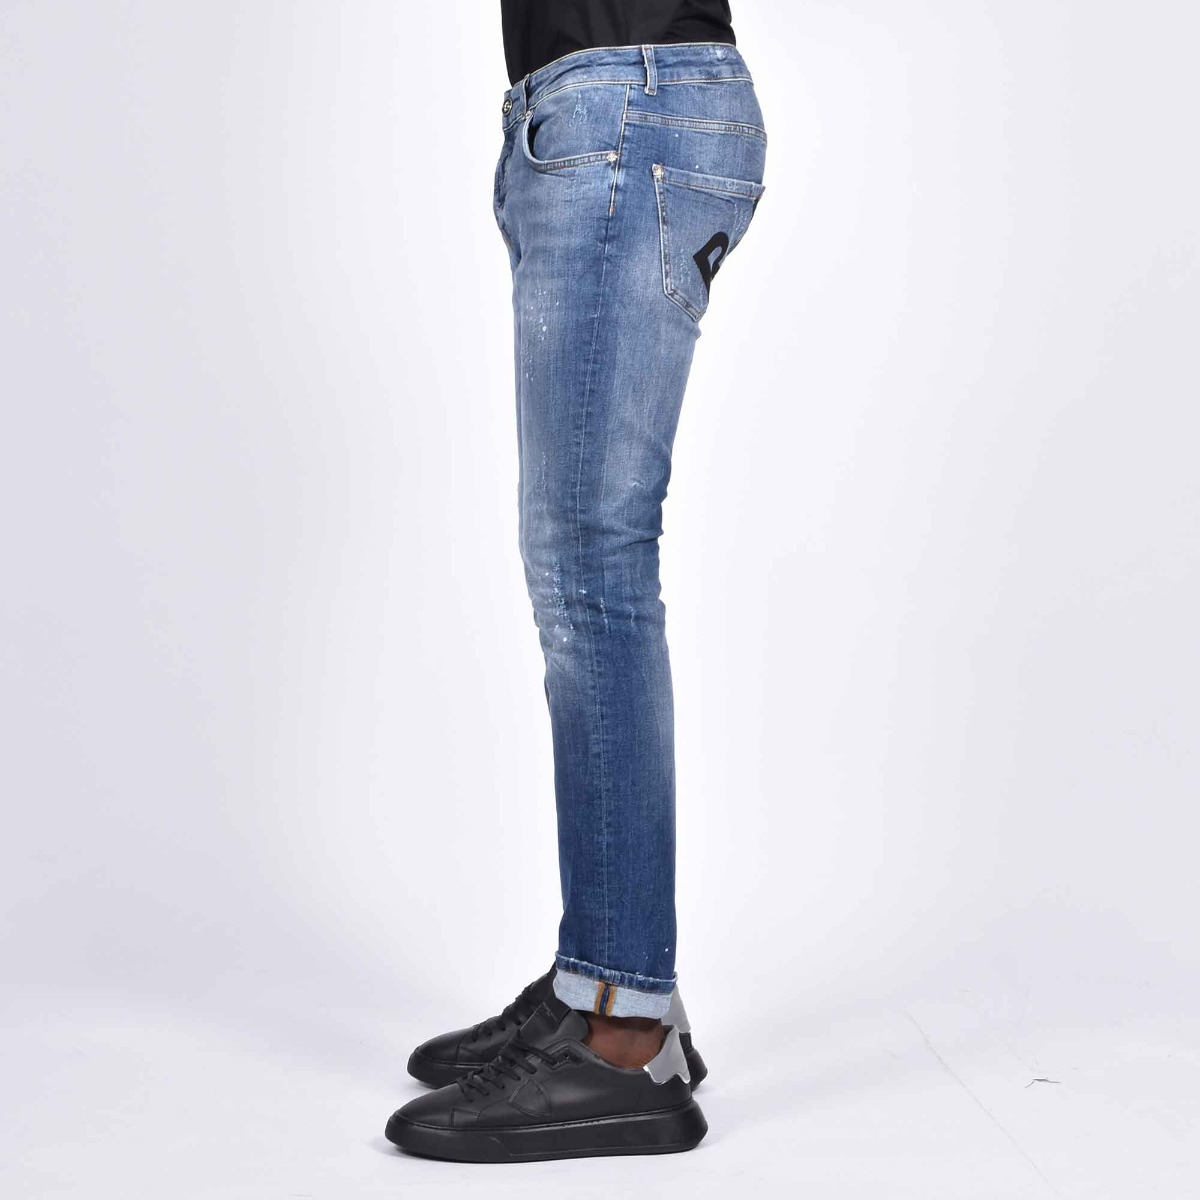 Jeans halland scritta rich